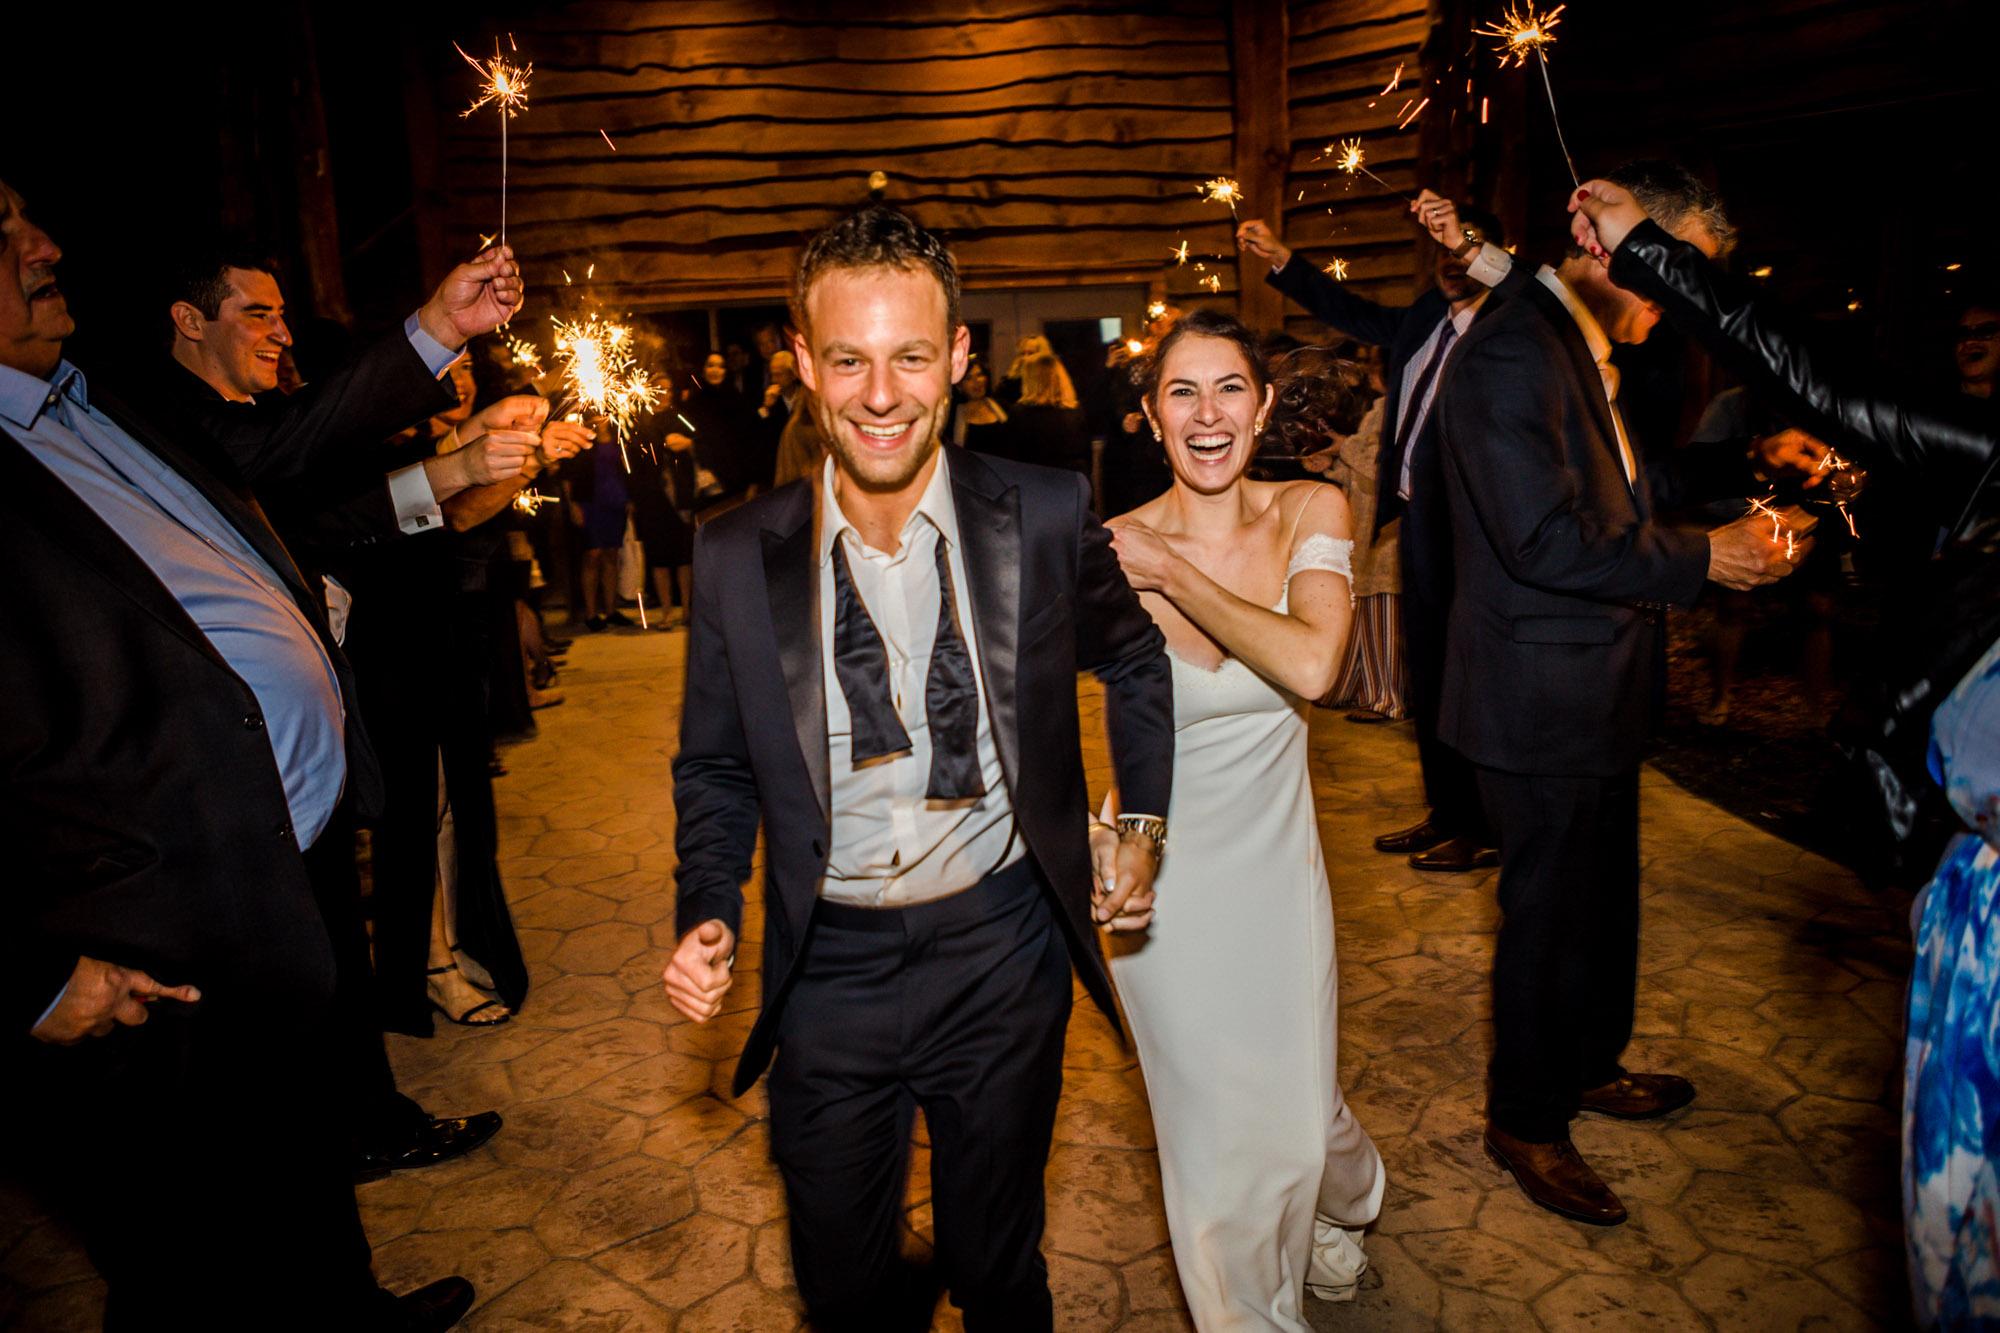 scranton_wedding_photographer_lettieri_pa (34 of 34).jpg